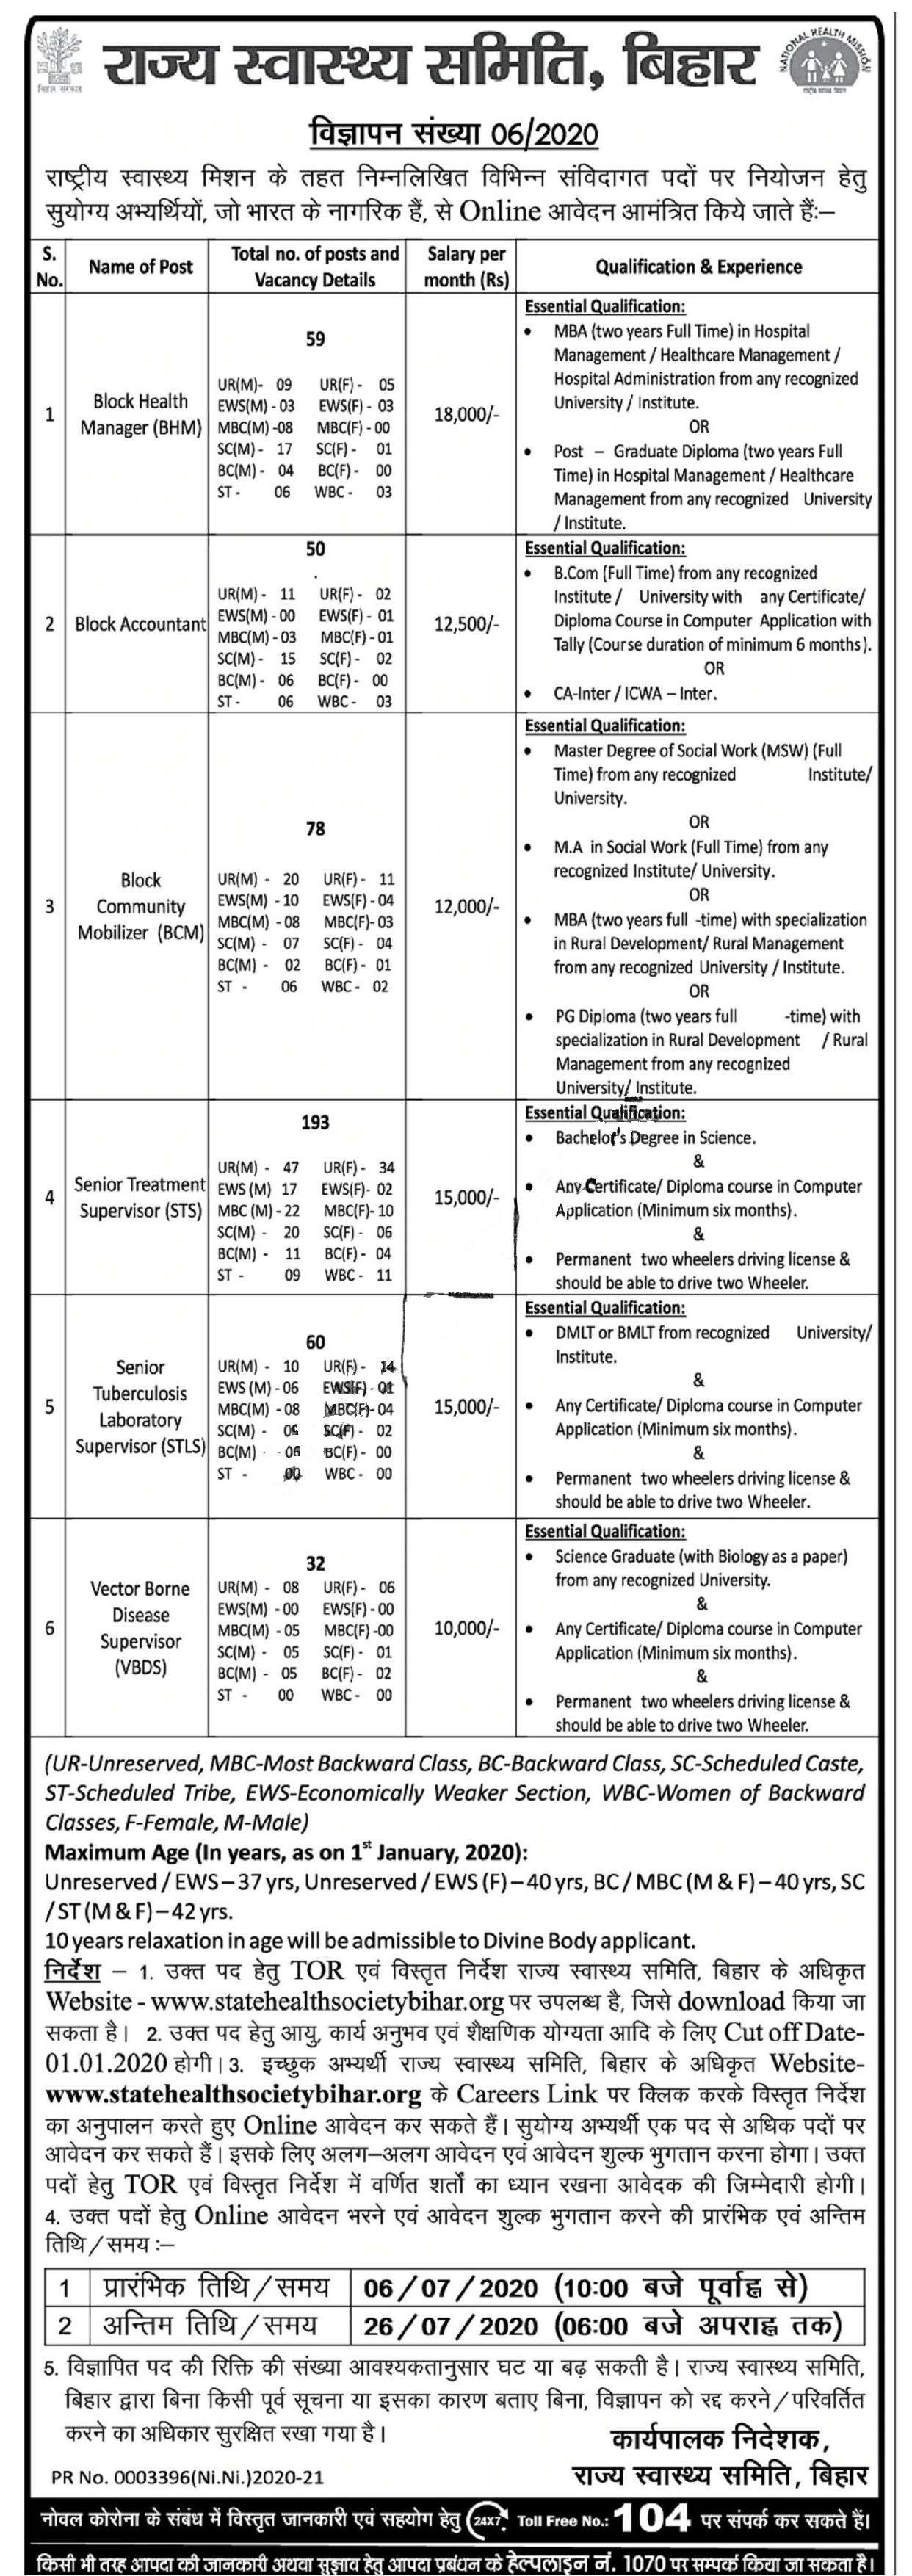 notification_pdf_of_state_health_society_bihar_recruitment_2020.jpg